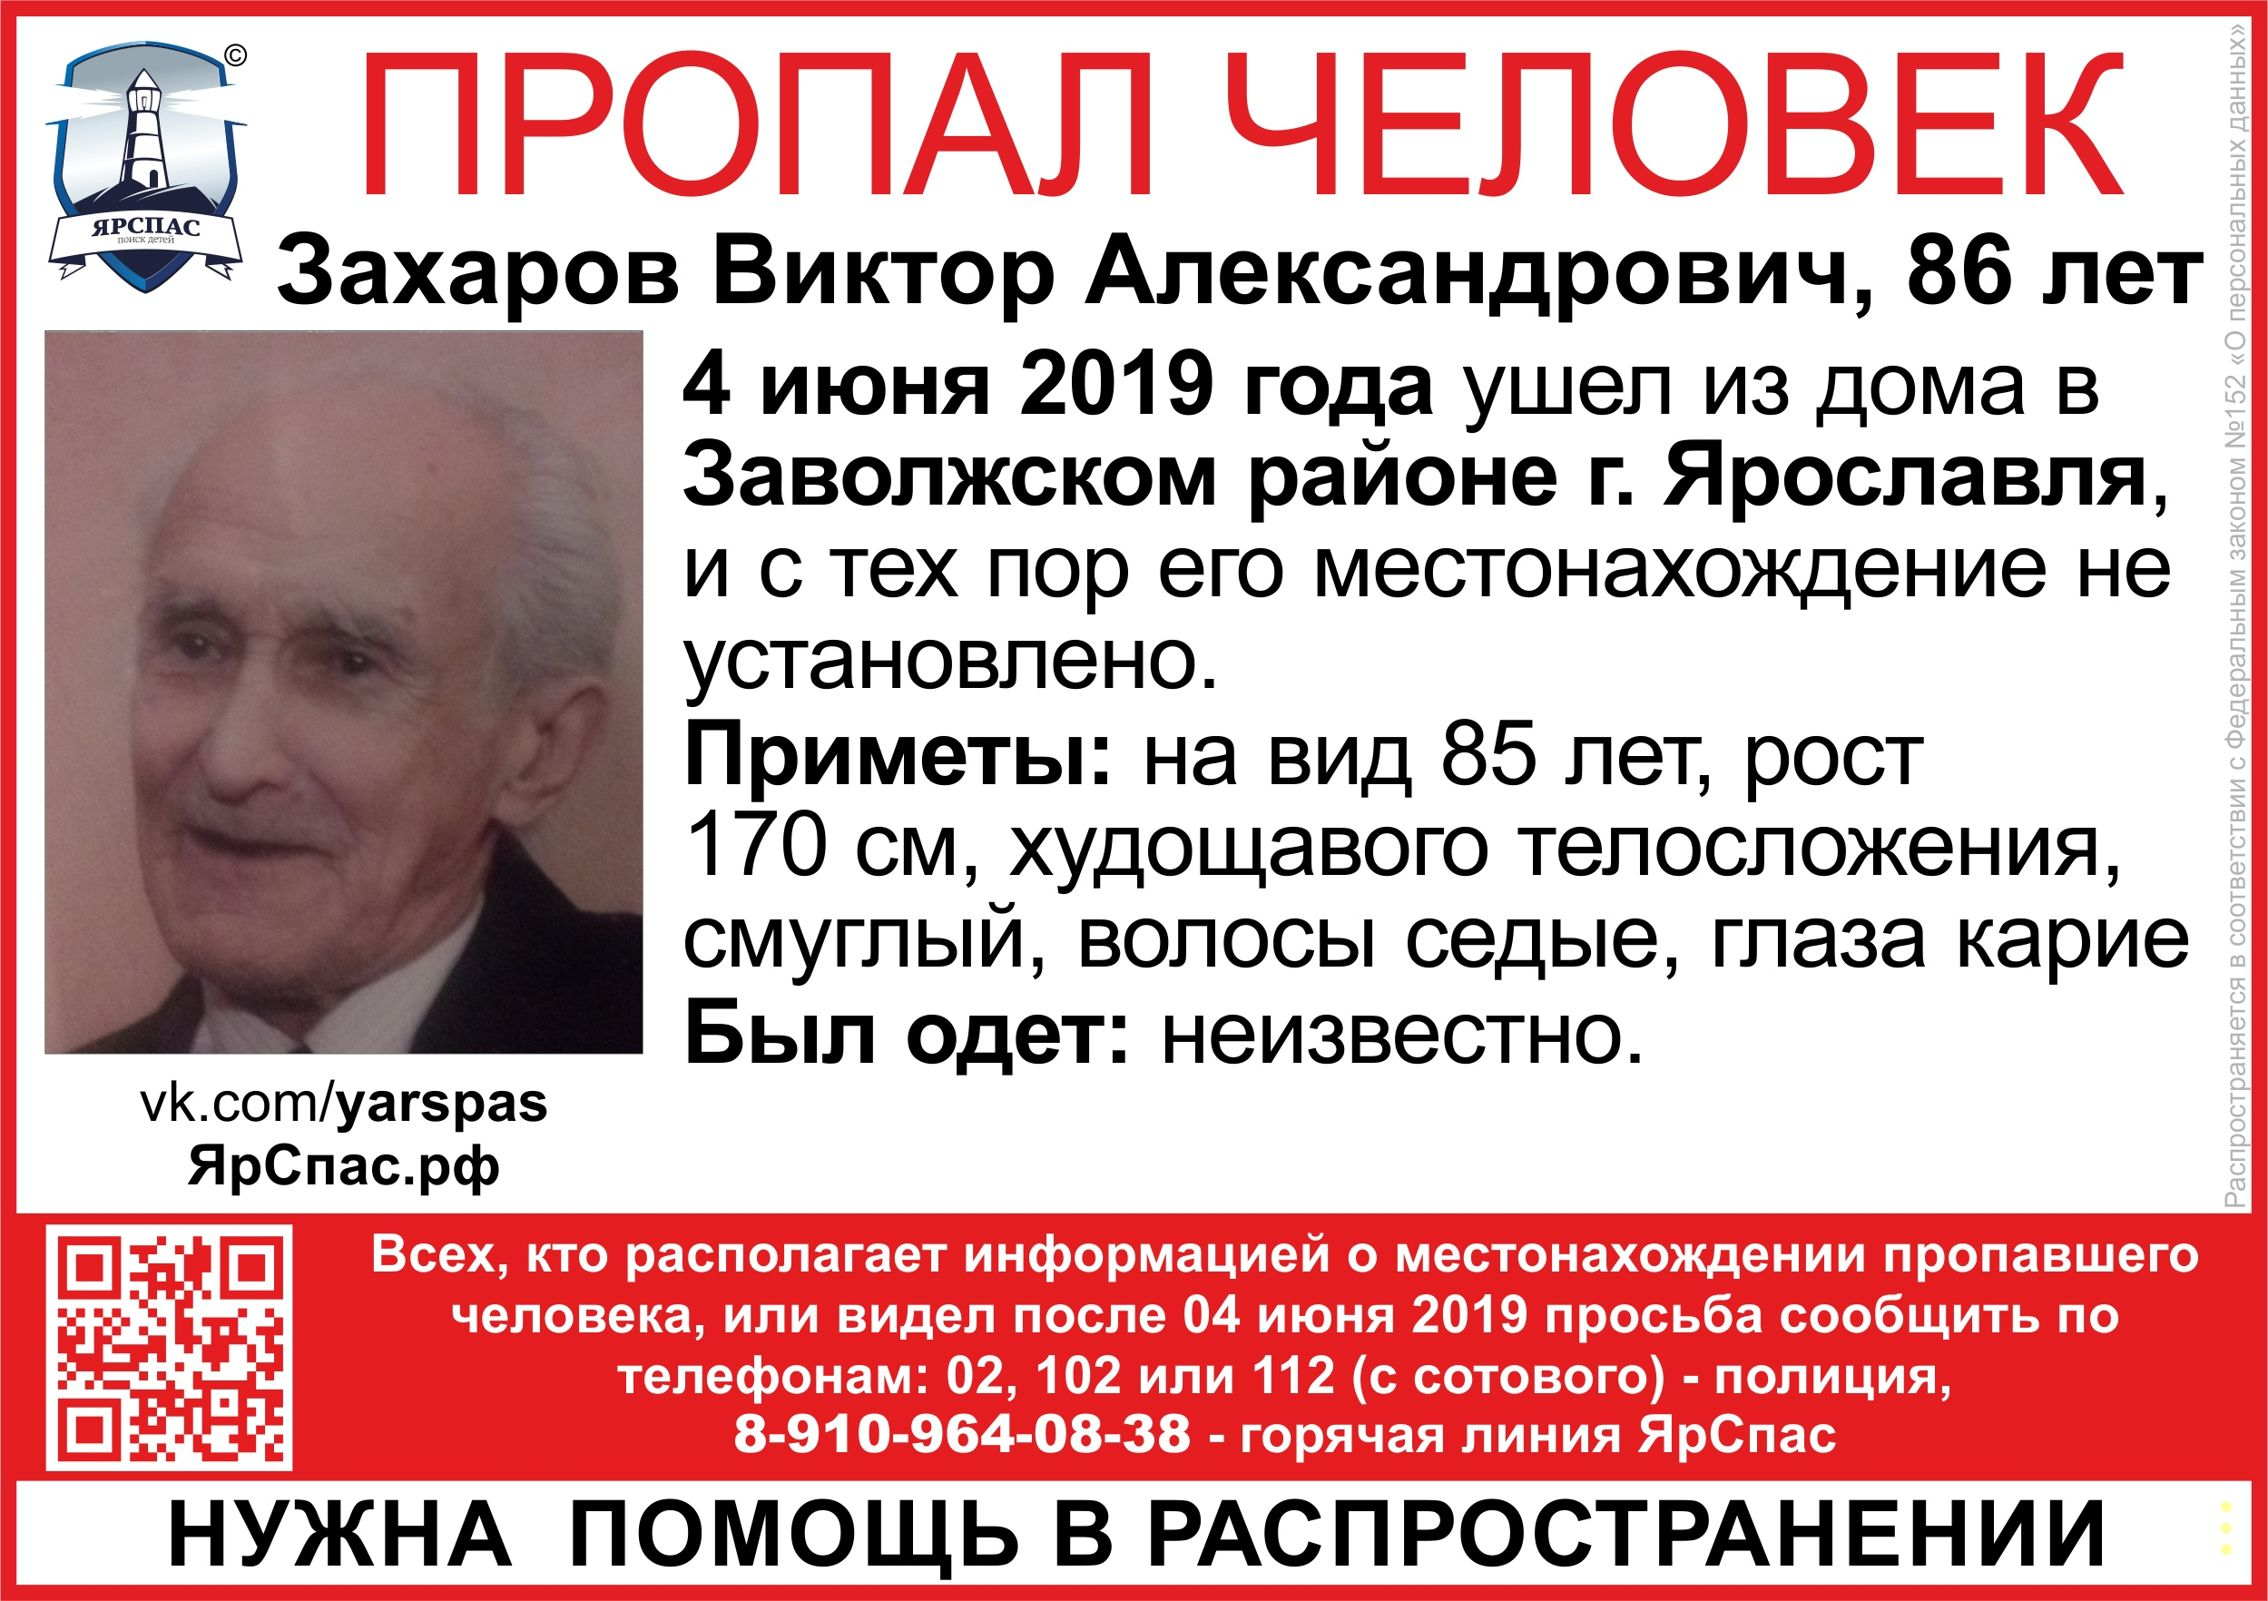 В Ярославле пропал 86-летний пенсионер